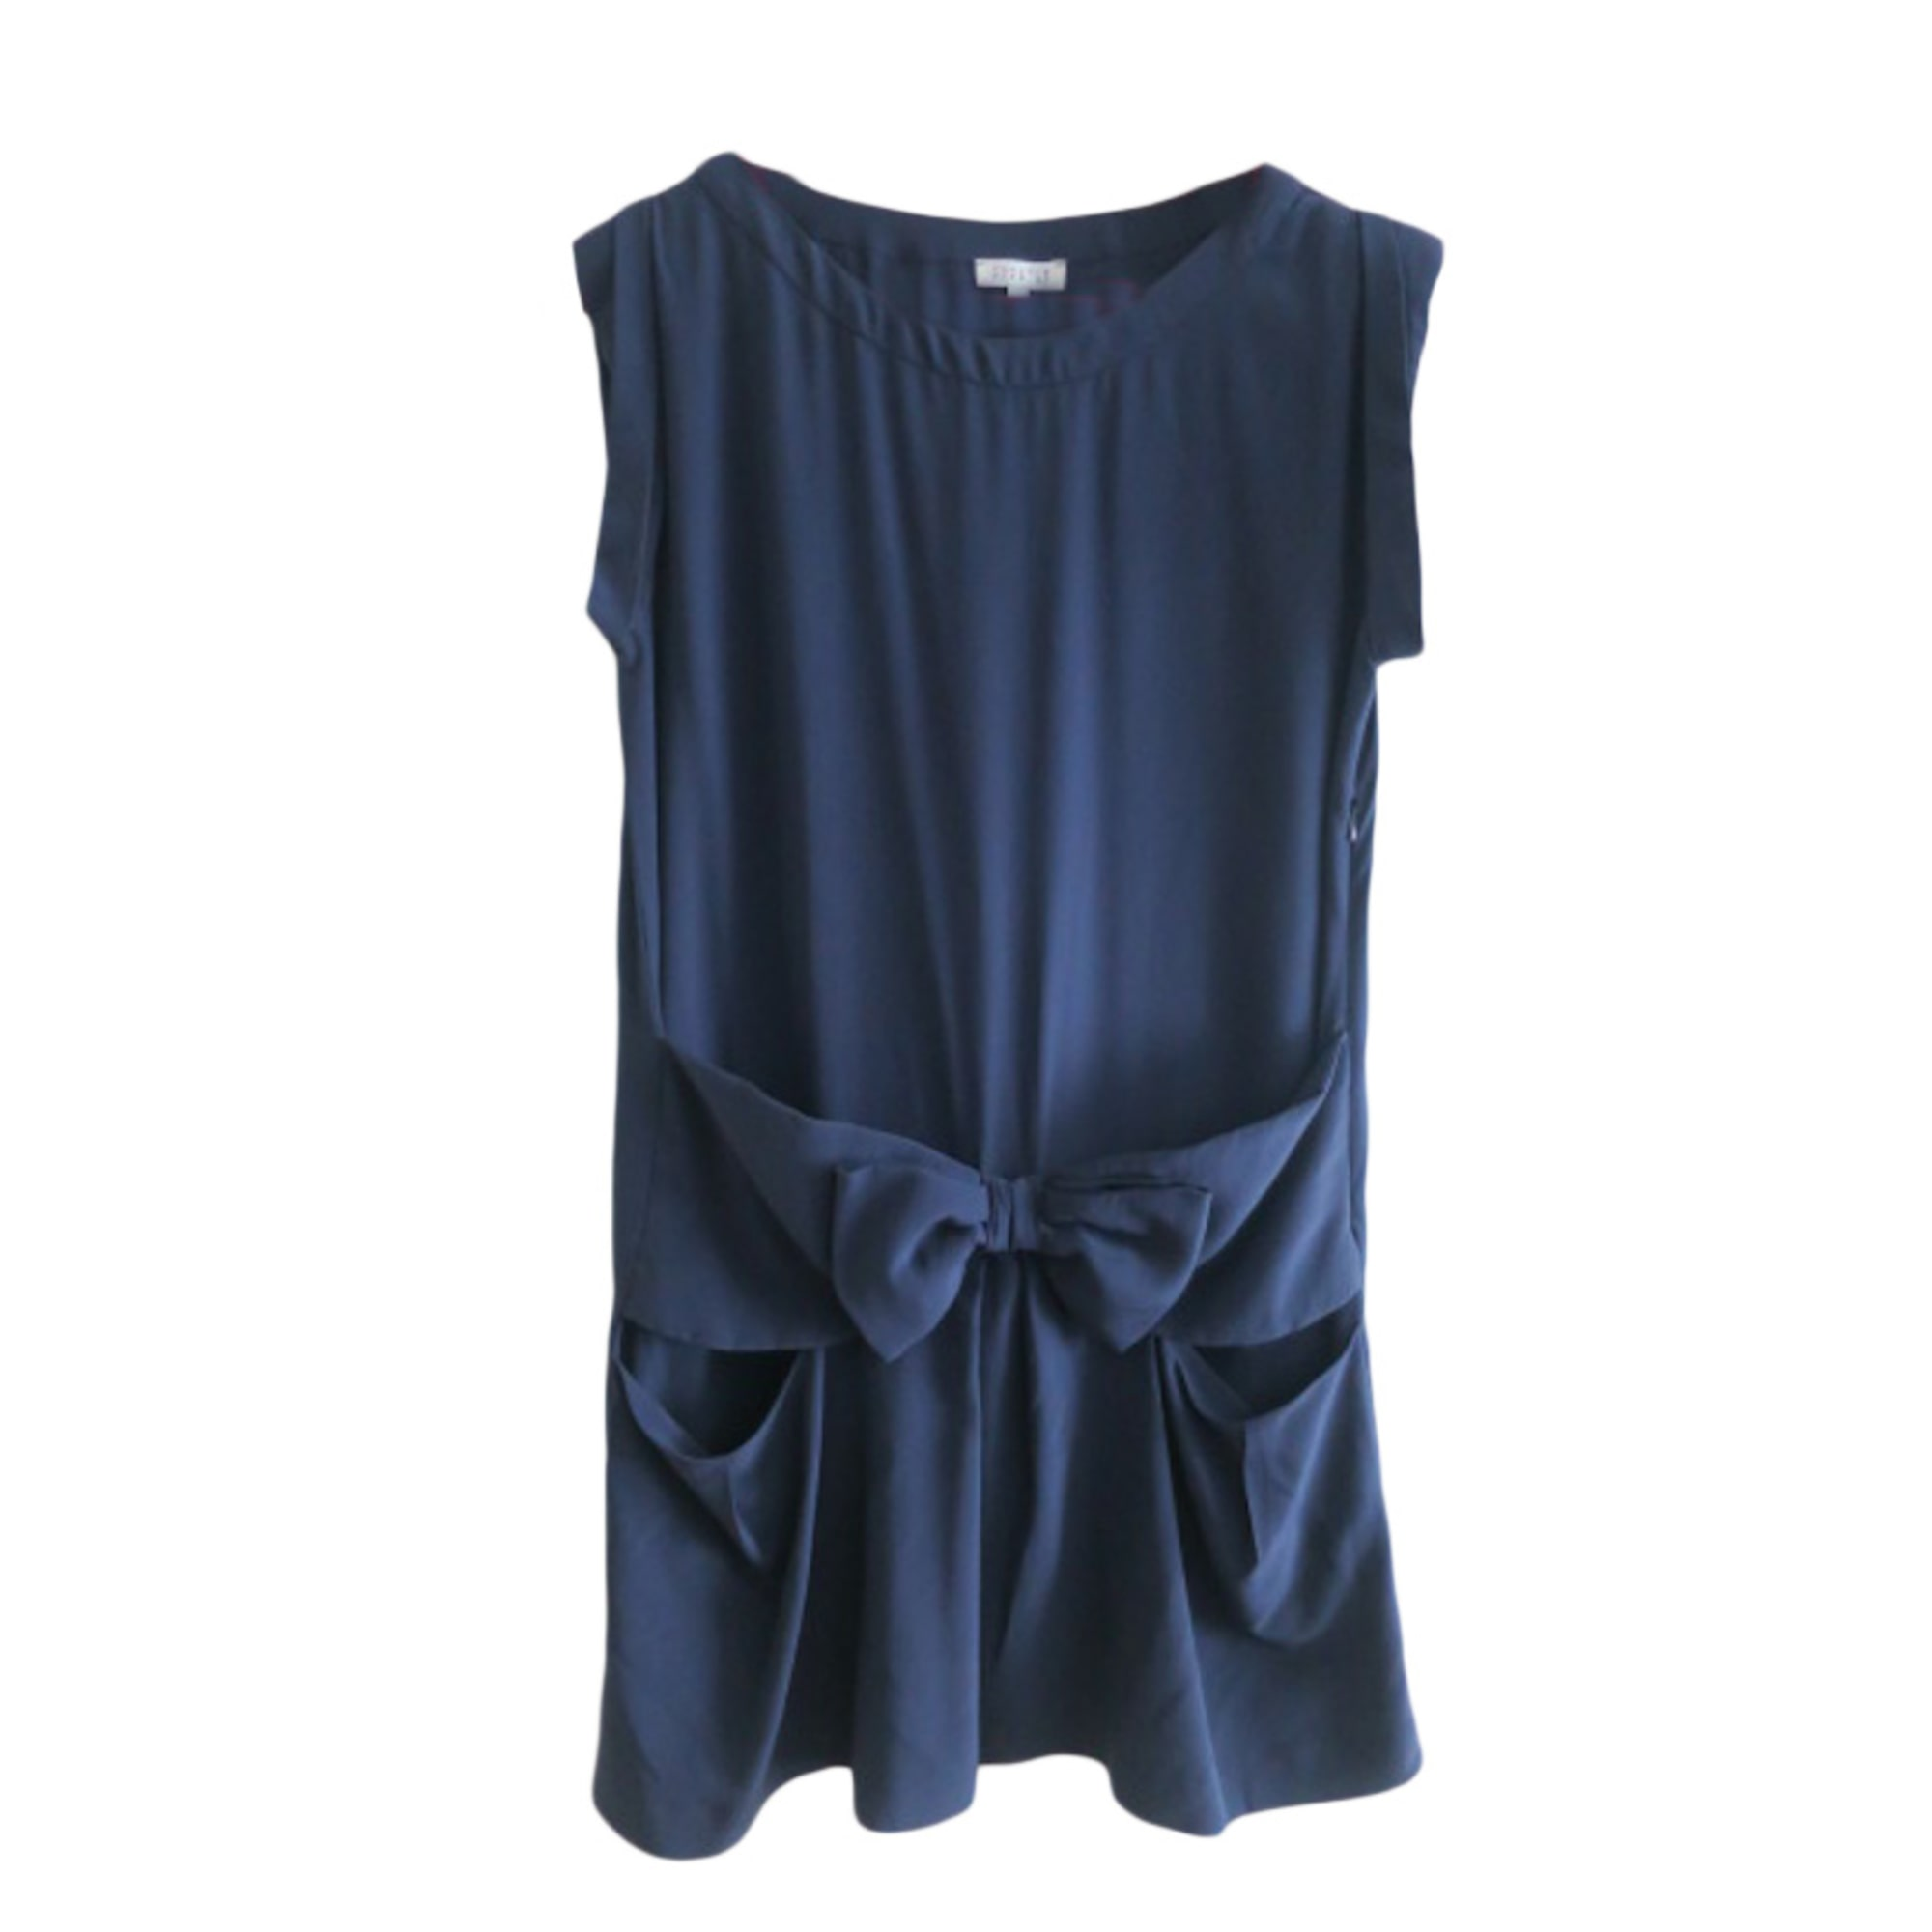 55ebb7f6aa8 Robe courte CLAUDIE PIERLOT 36 (S